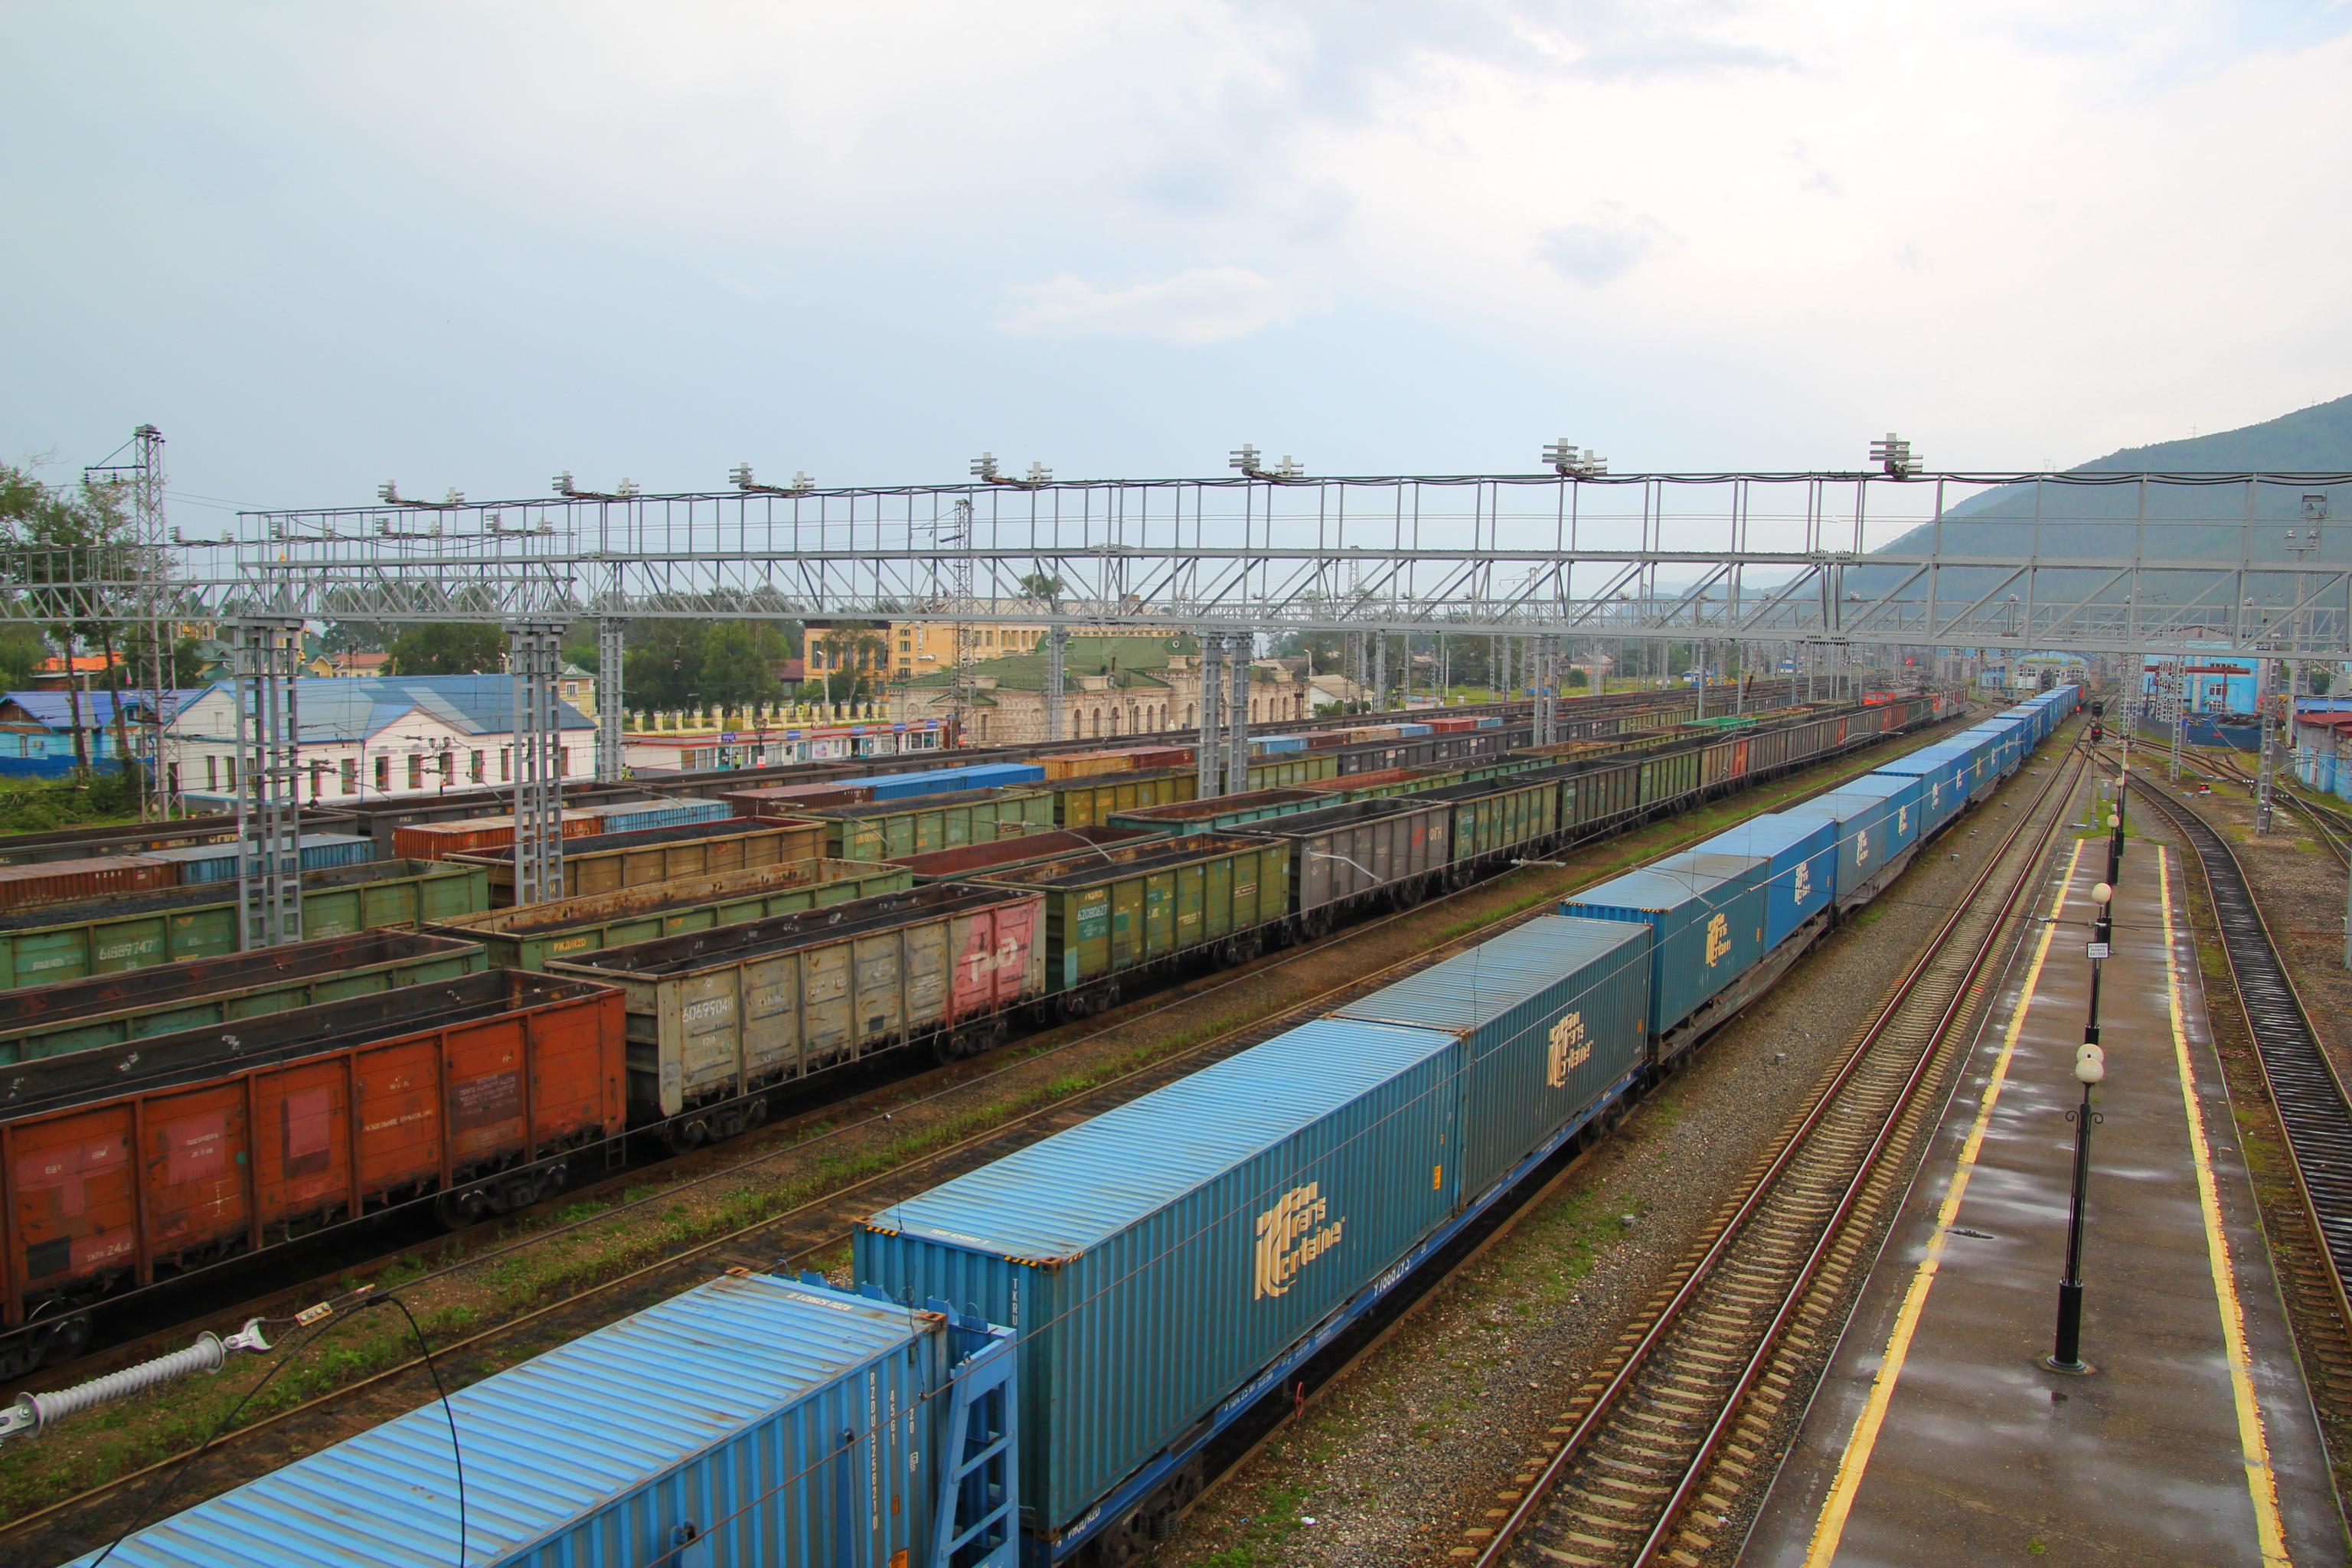 Sljuďanka (Slyudyanka, Слюдянка) - nádraží